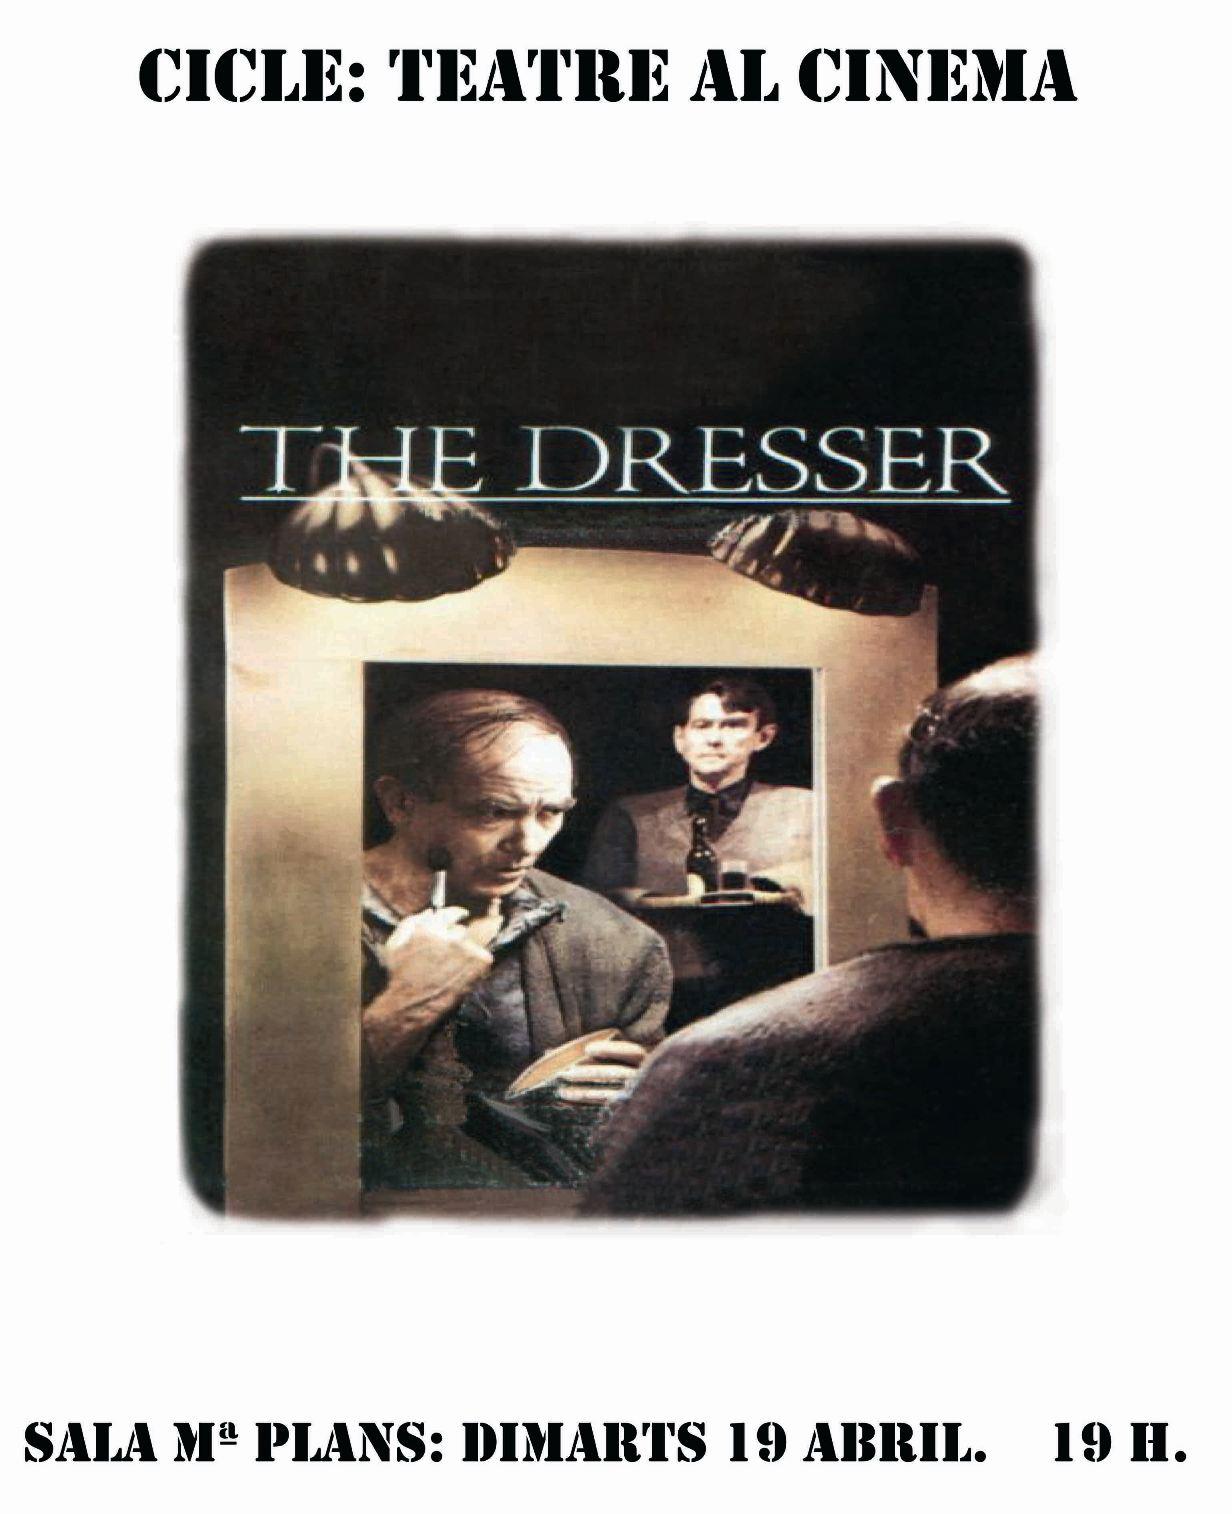 Cicle Teatre al Cinema: The Dresser. Sala Maria Plans de Terrassa, 19 abril, 19 h.